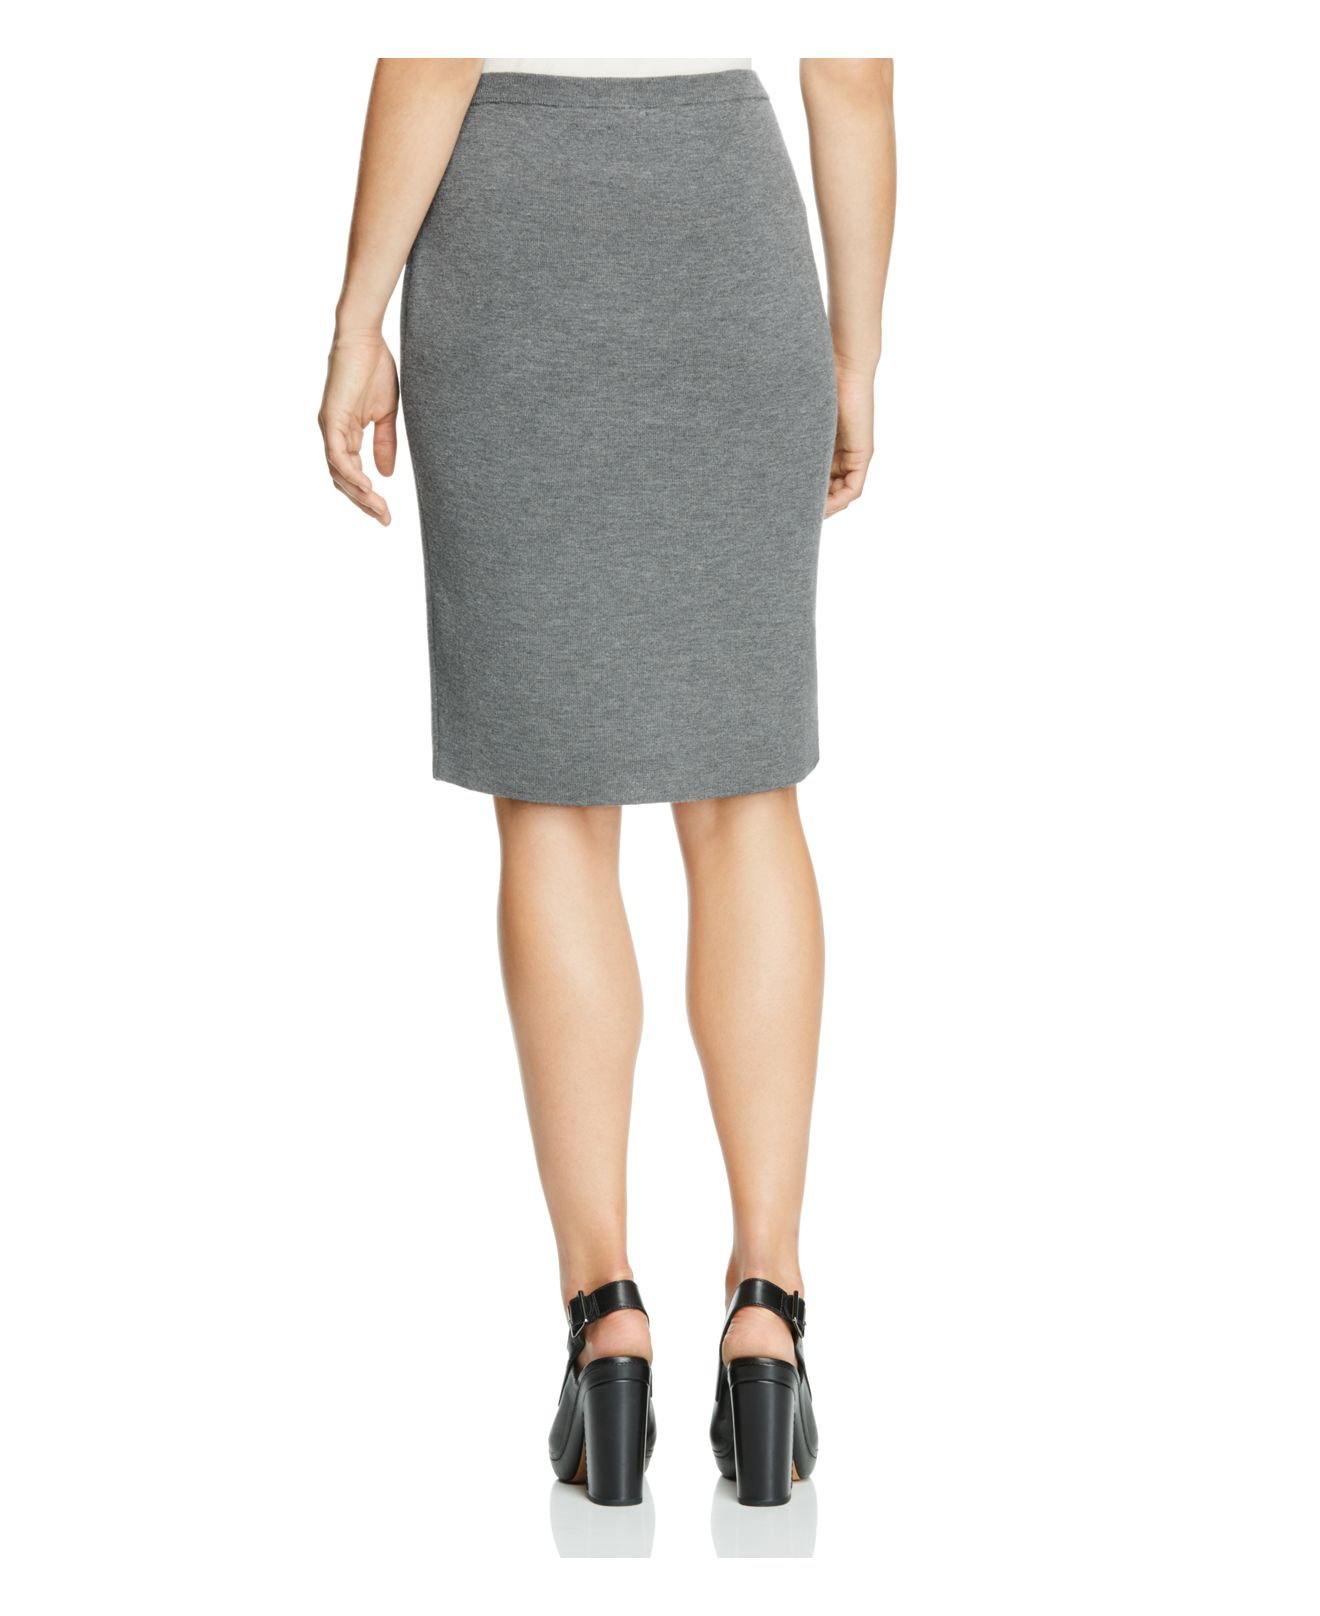 eileen fisher wool knit pencil skirt in gray lyst